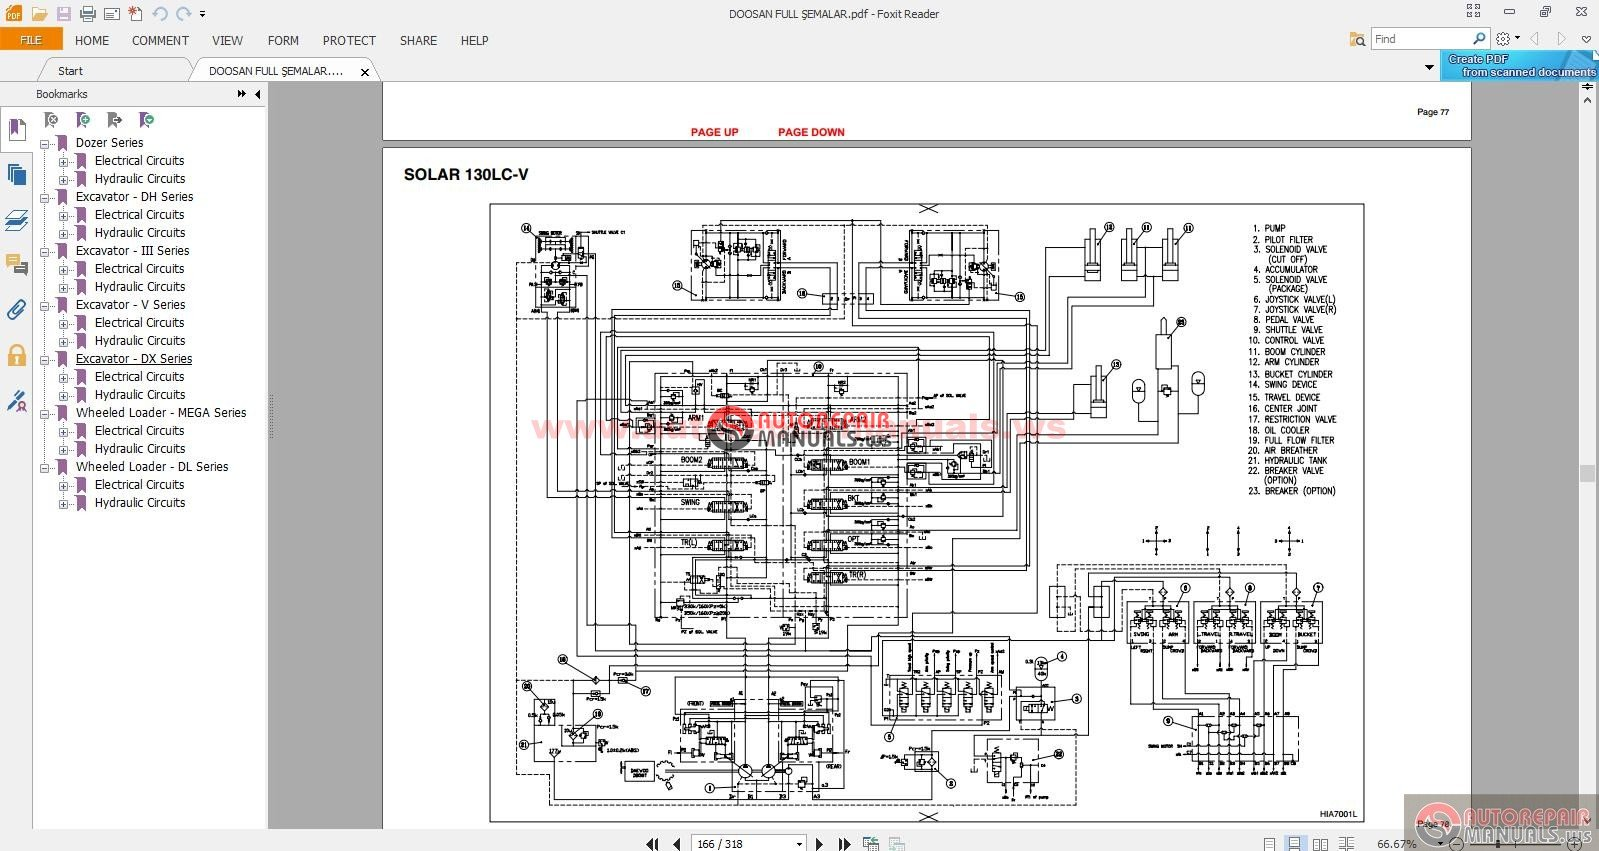 isuzu npr 200 wiring diagram for caravan socket free auto repair manual doosan full